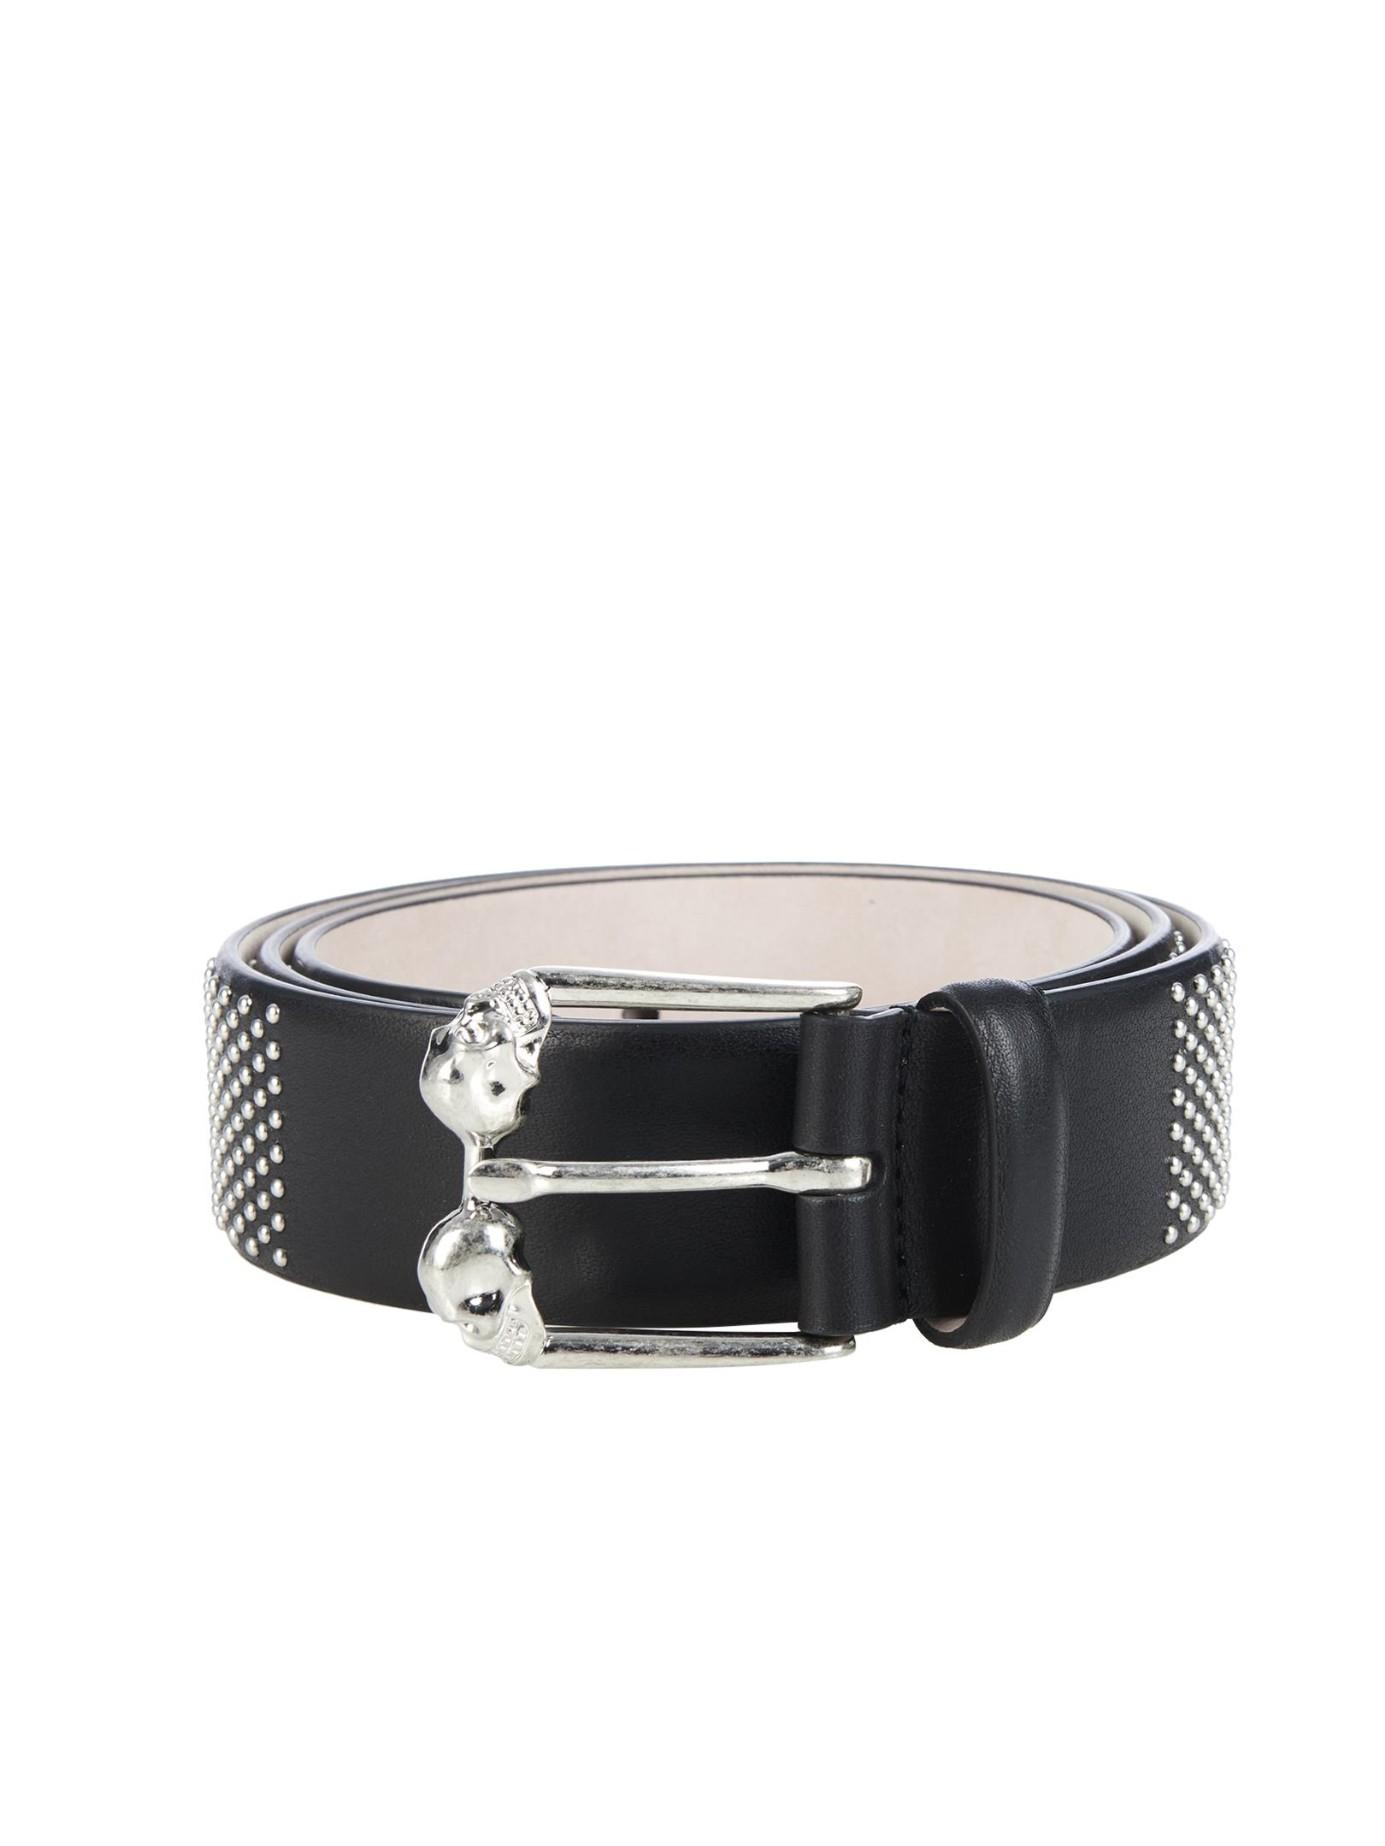 Black and Gold Studded Belt Alexander McQueen I6QAFjd6Zb